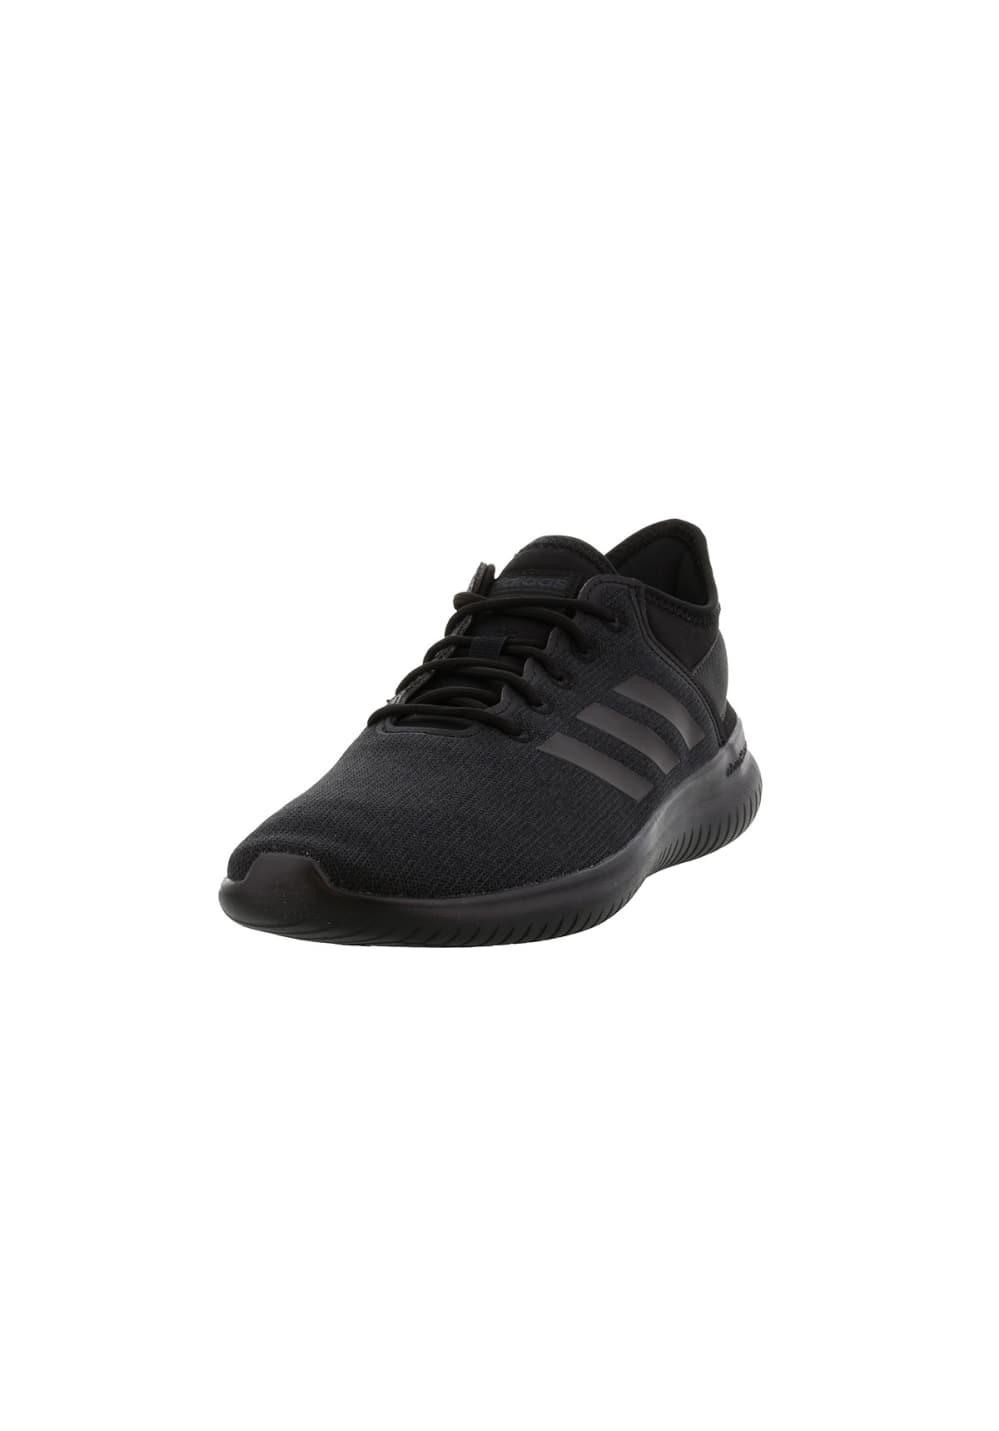 adidas neo Cloudfoam QT Flex - Laufschuhe für Damen - Schwarz